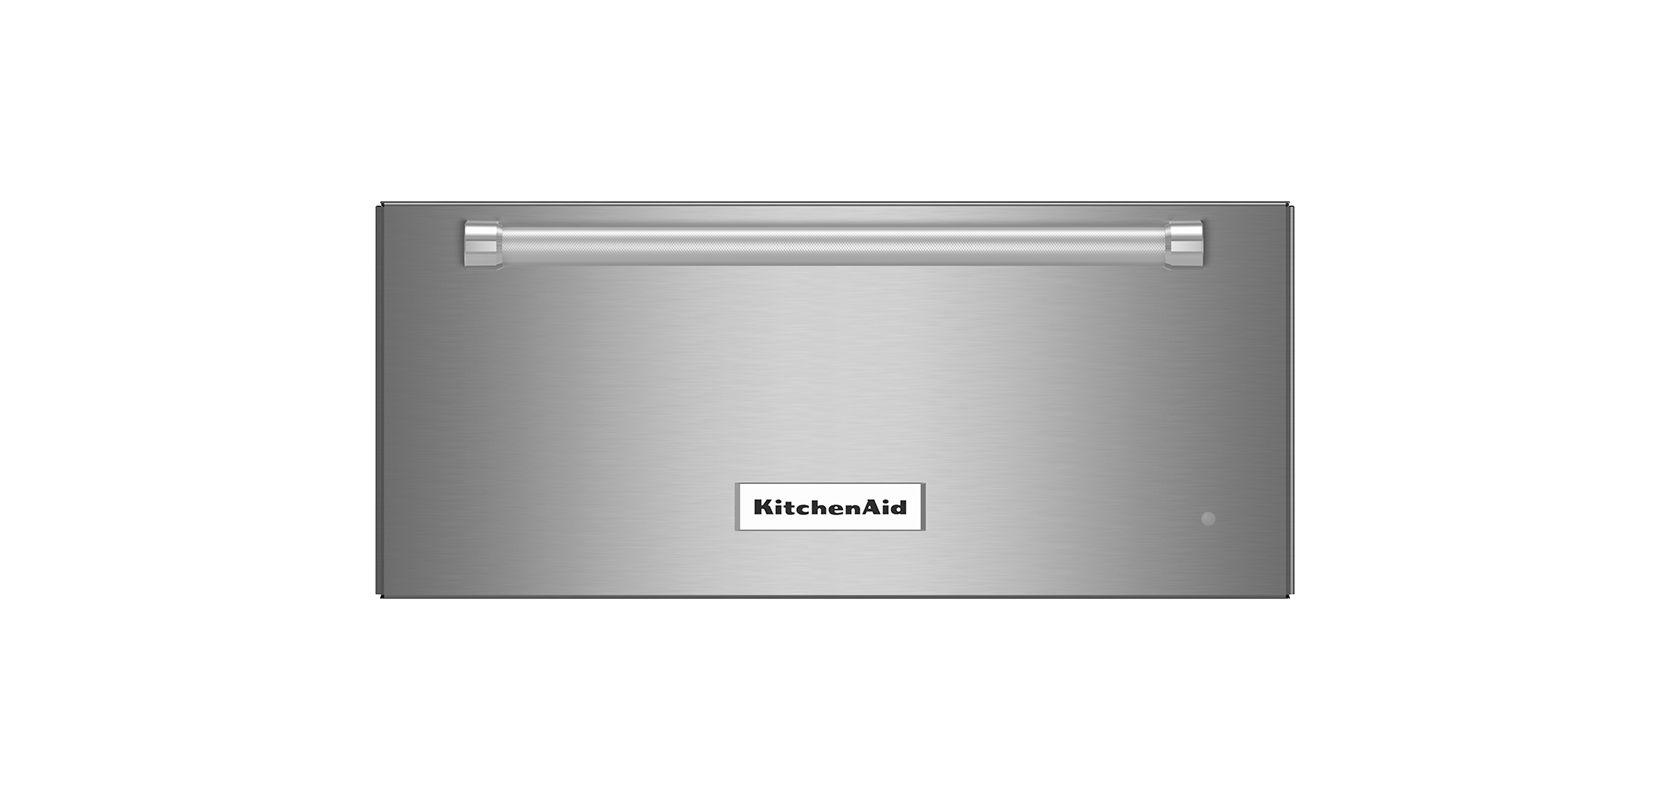 KitchenAid KOWT104E 24 Inch Wide 1.1 Cu. Ft. Slow Cook Warming Drawer photo